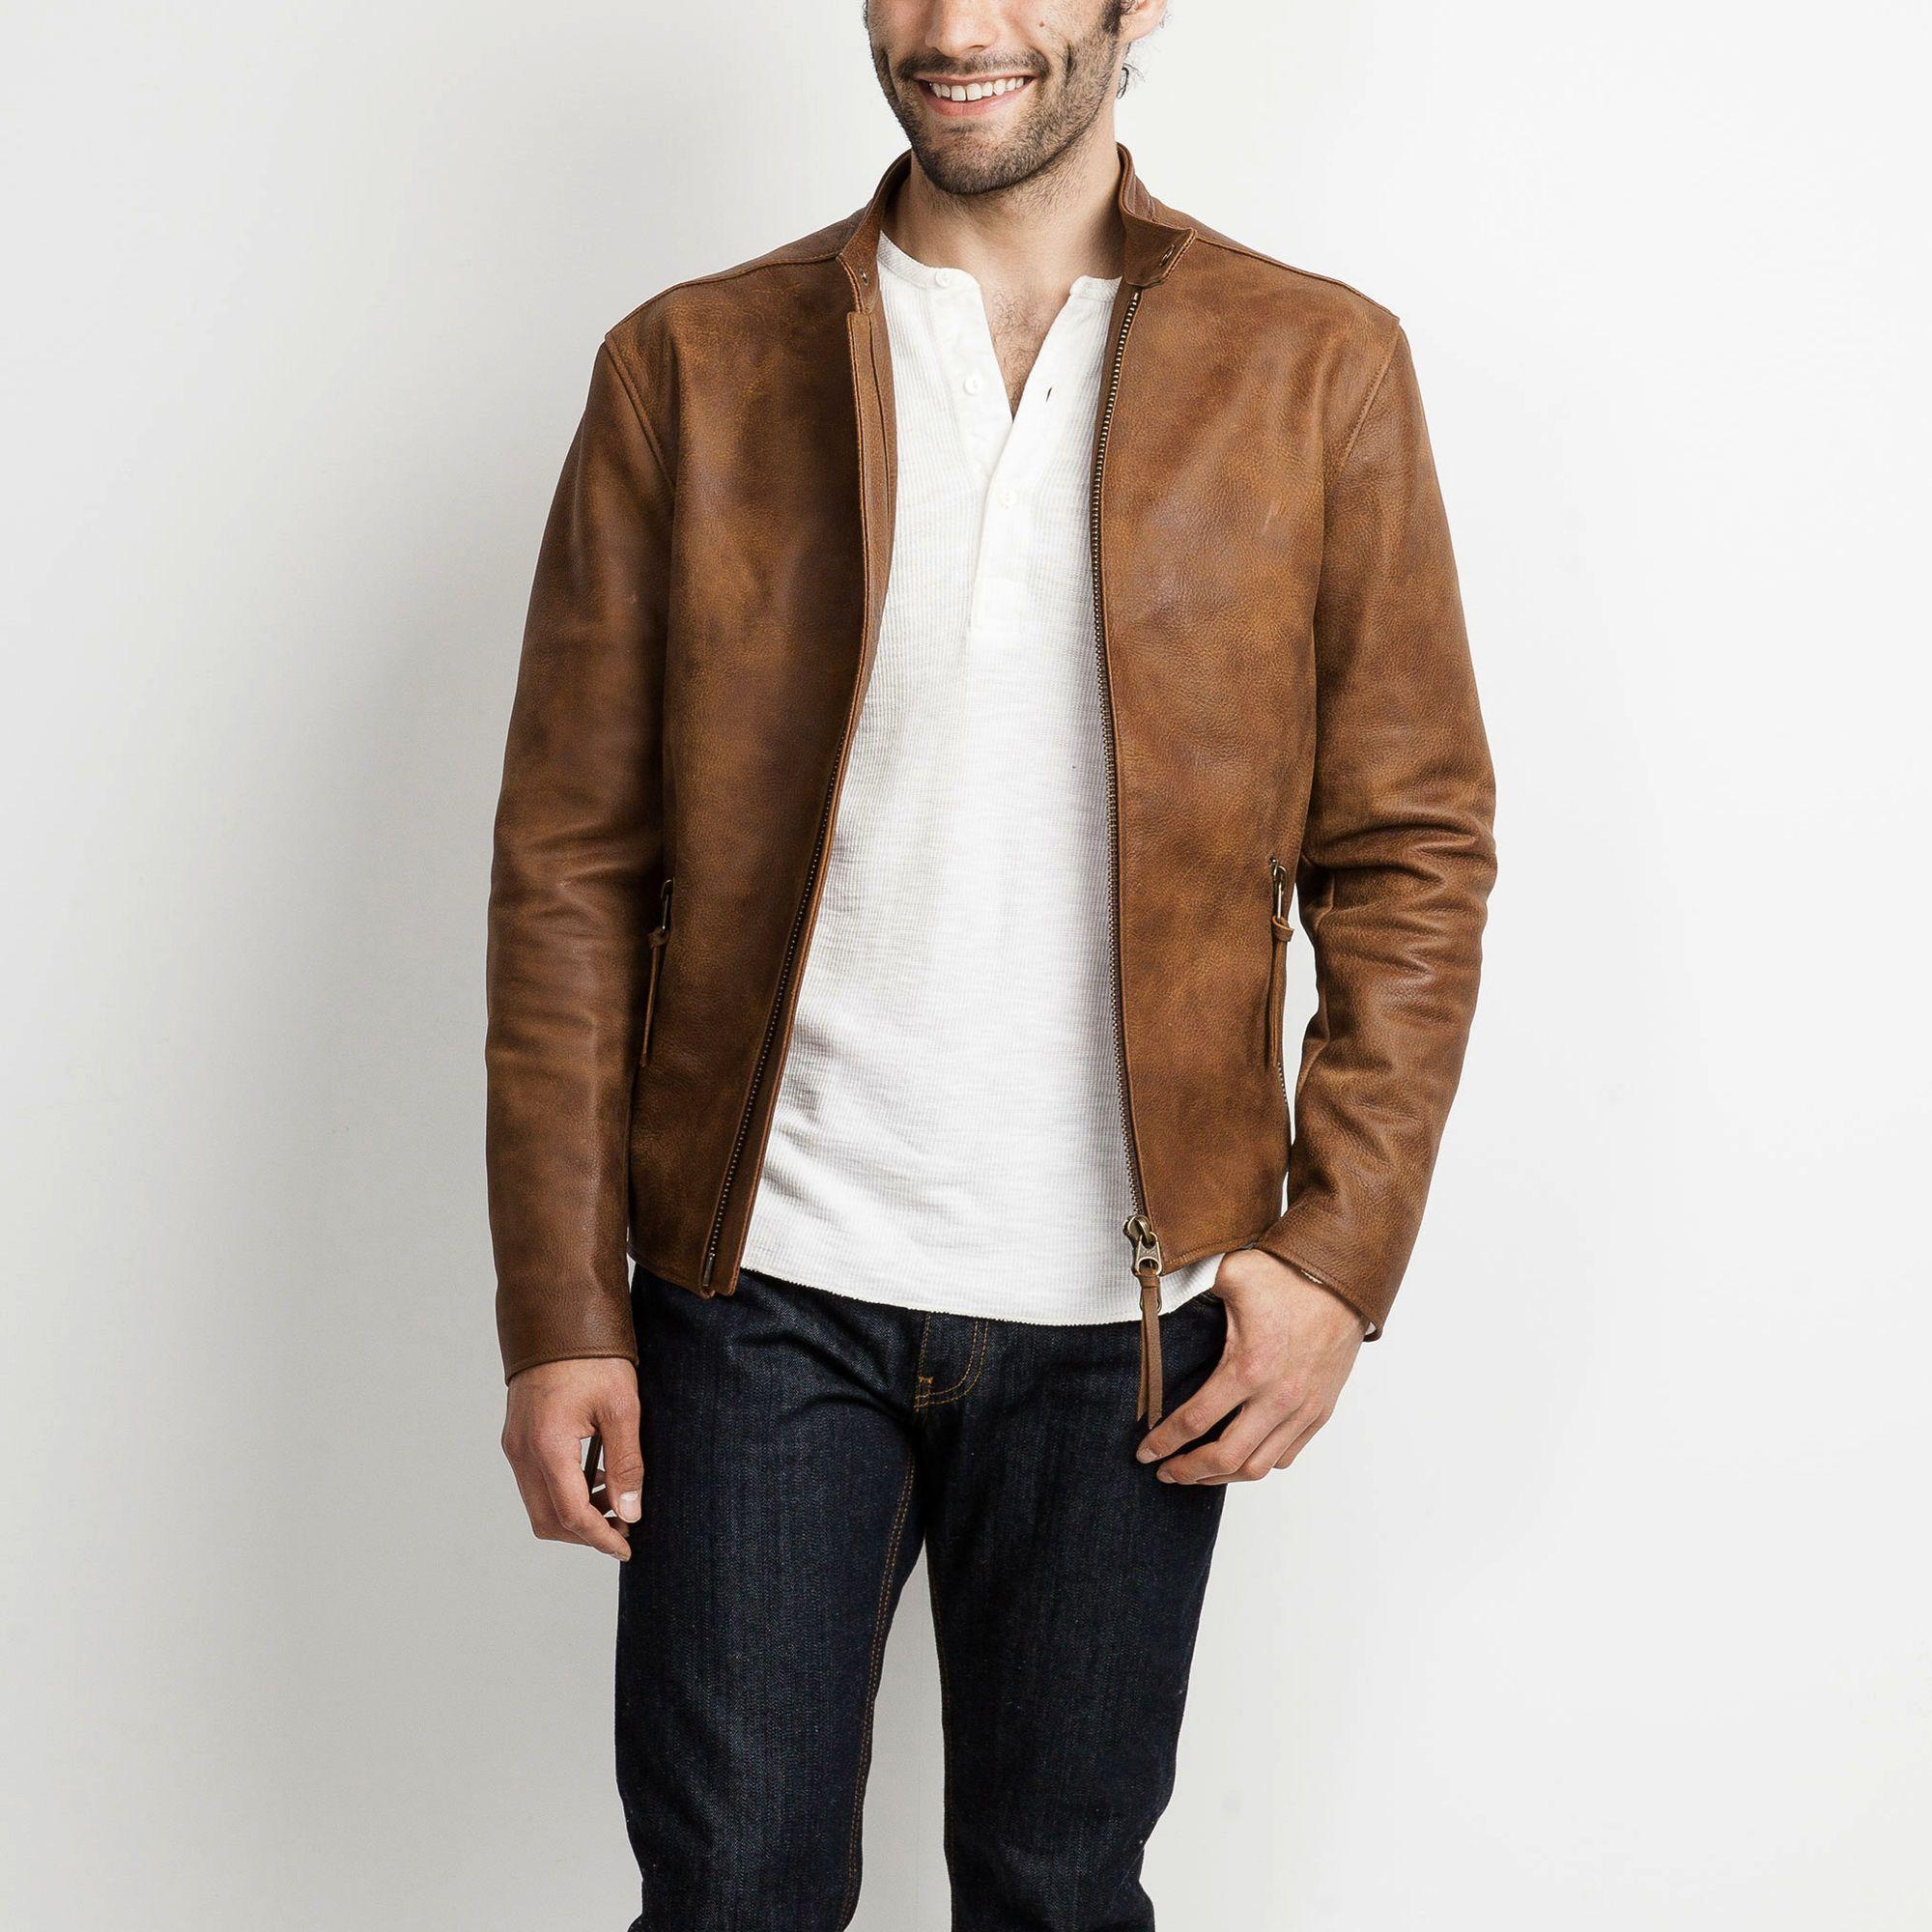 Leather jacket repair toronto - Jackets